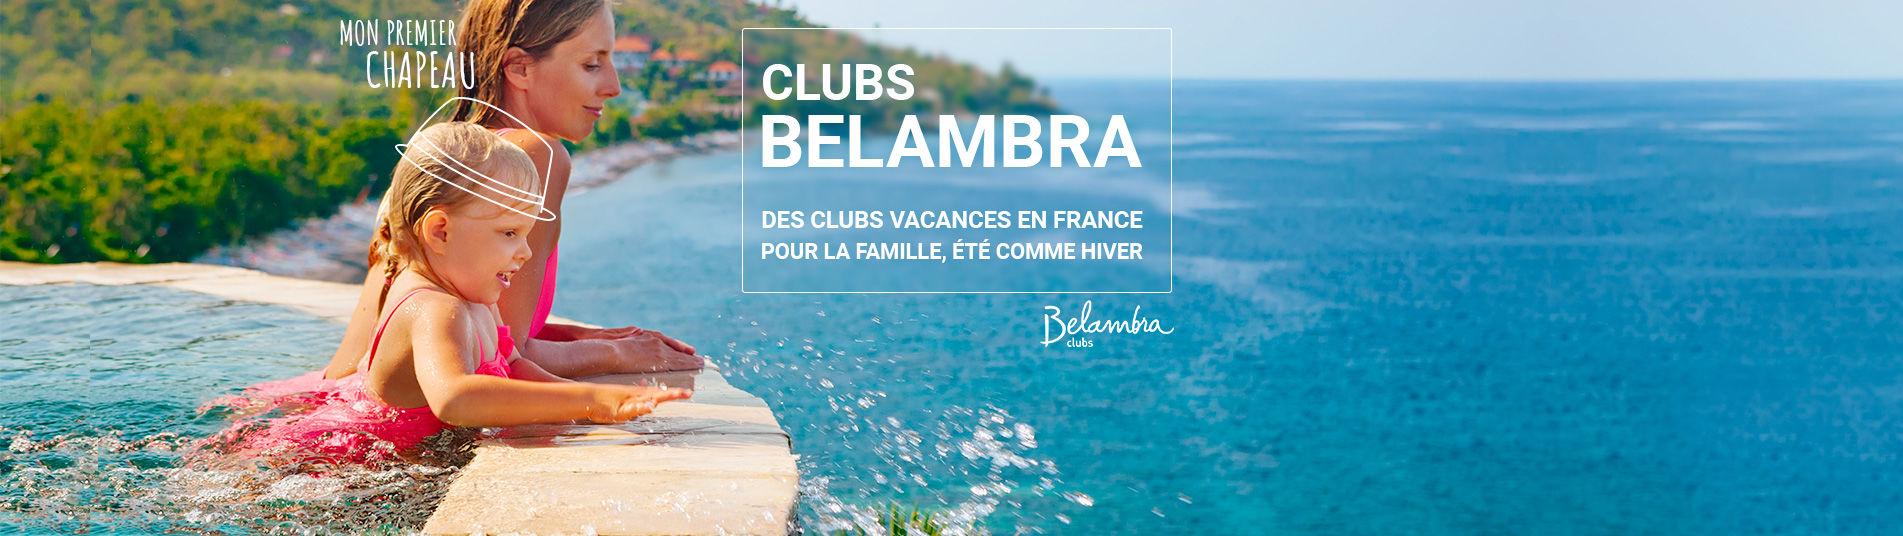 Vacances en Club avec Belambra